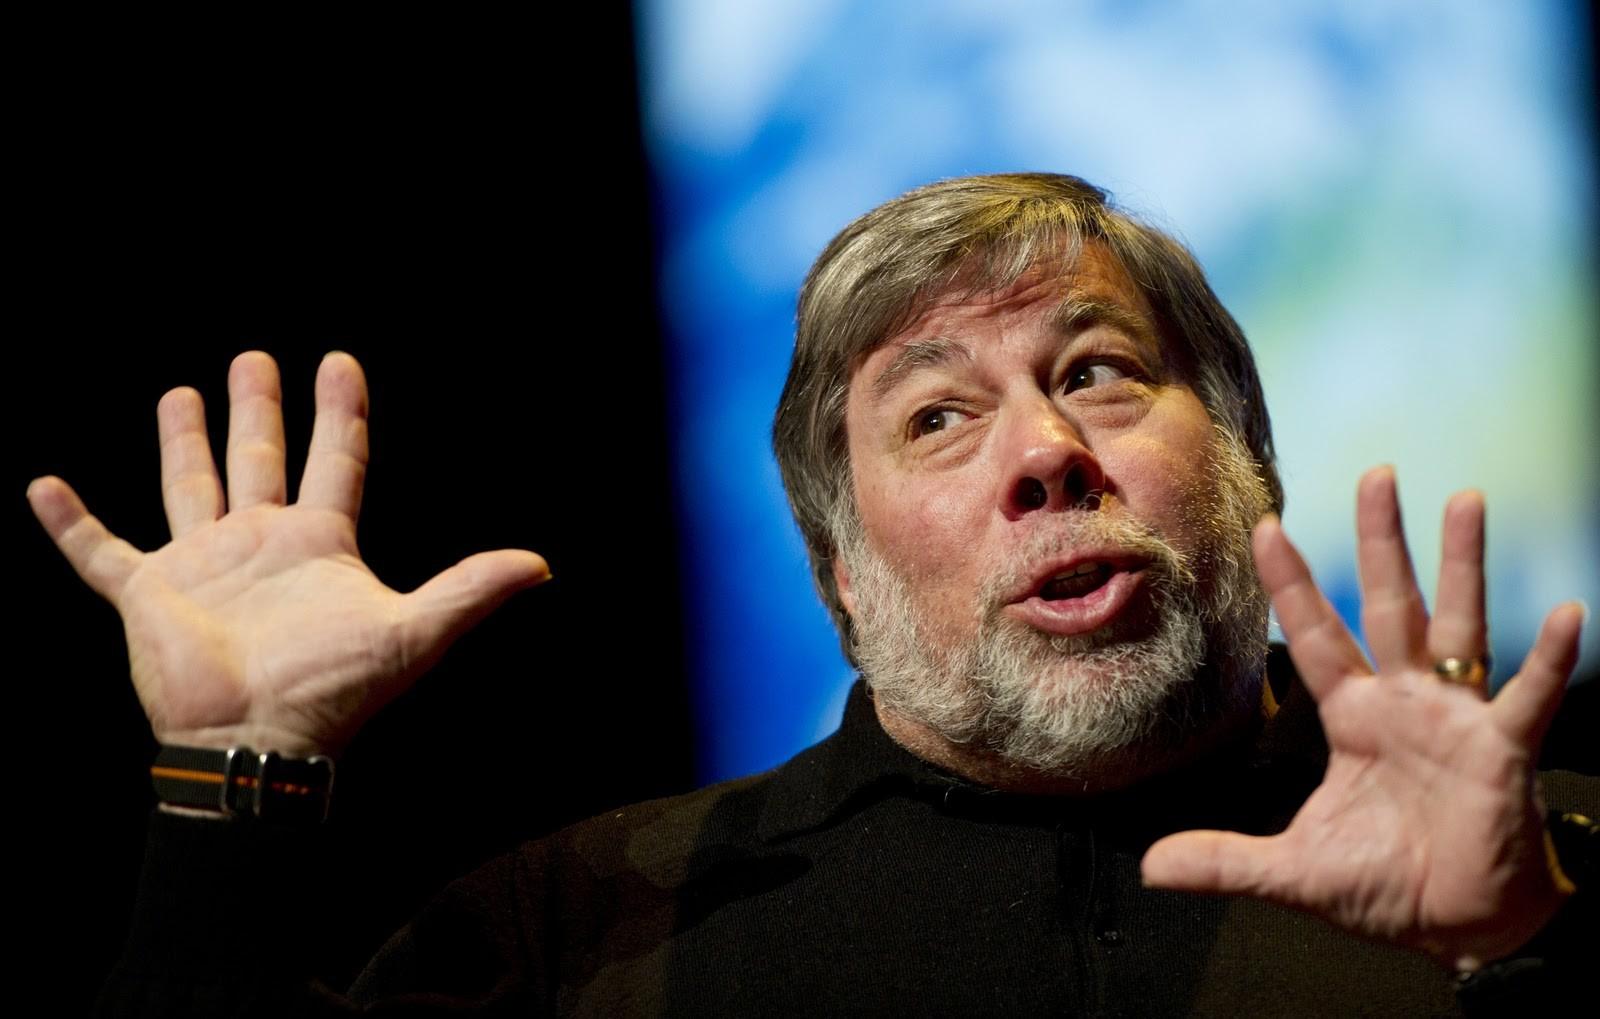 Steve Wozniak: Steve jobs would be proud of Apple